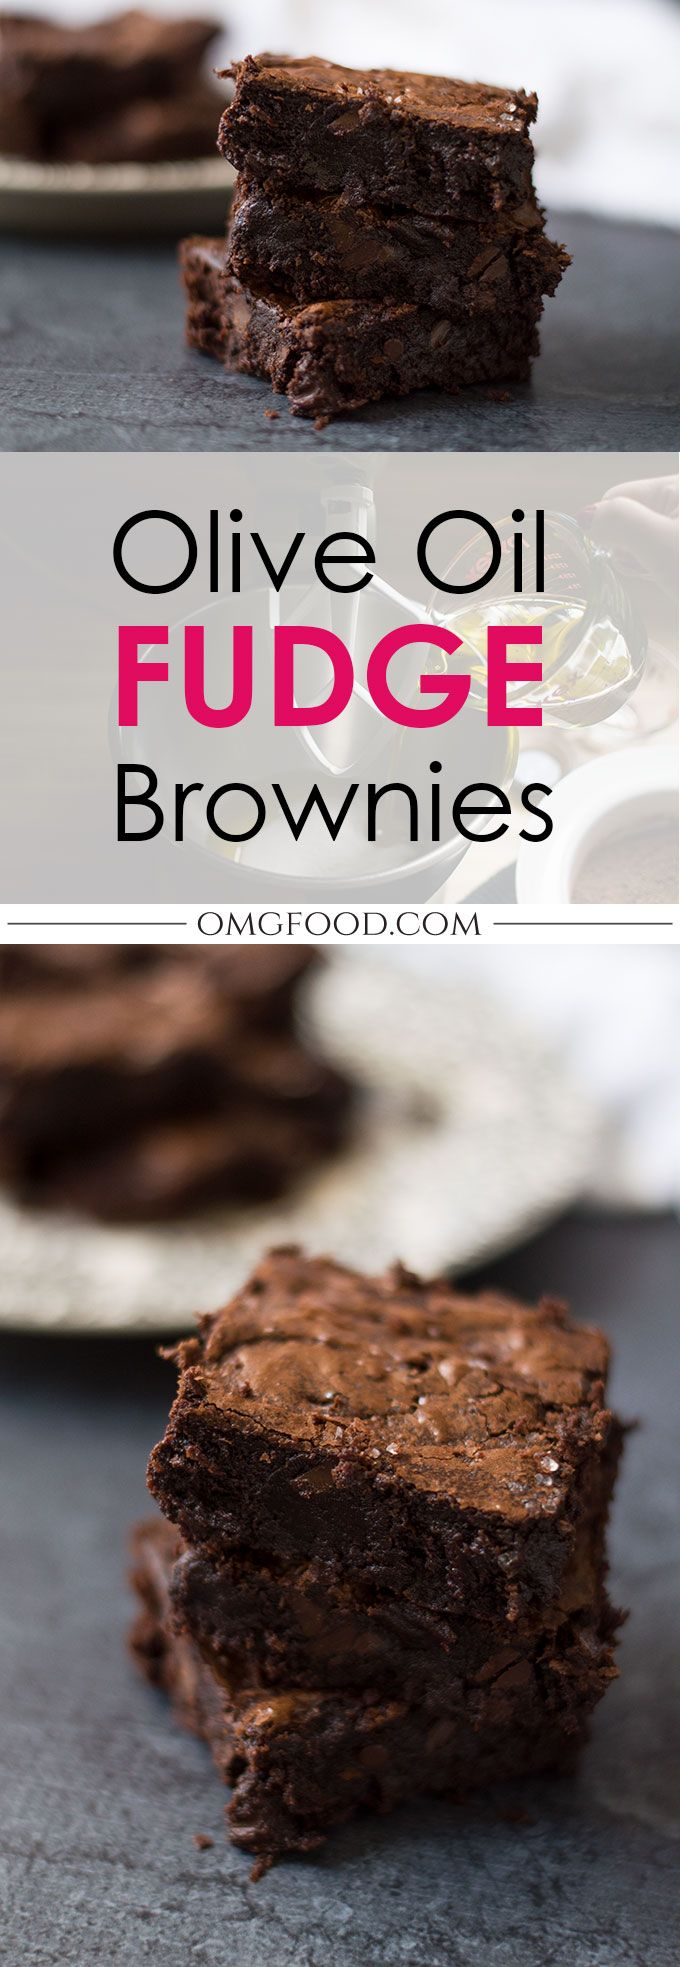 Olive Oil Fudge Brownies   omgfood.com